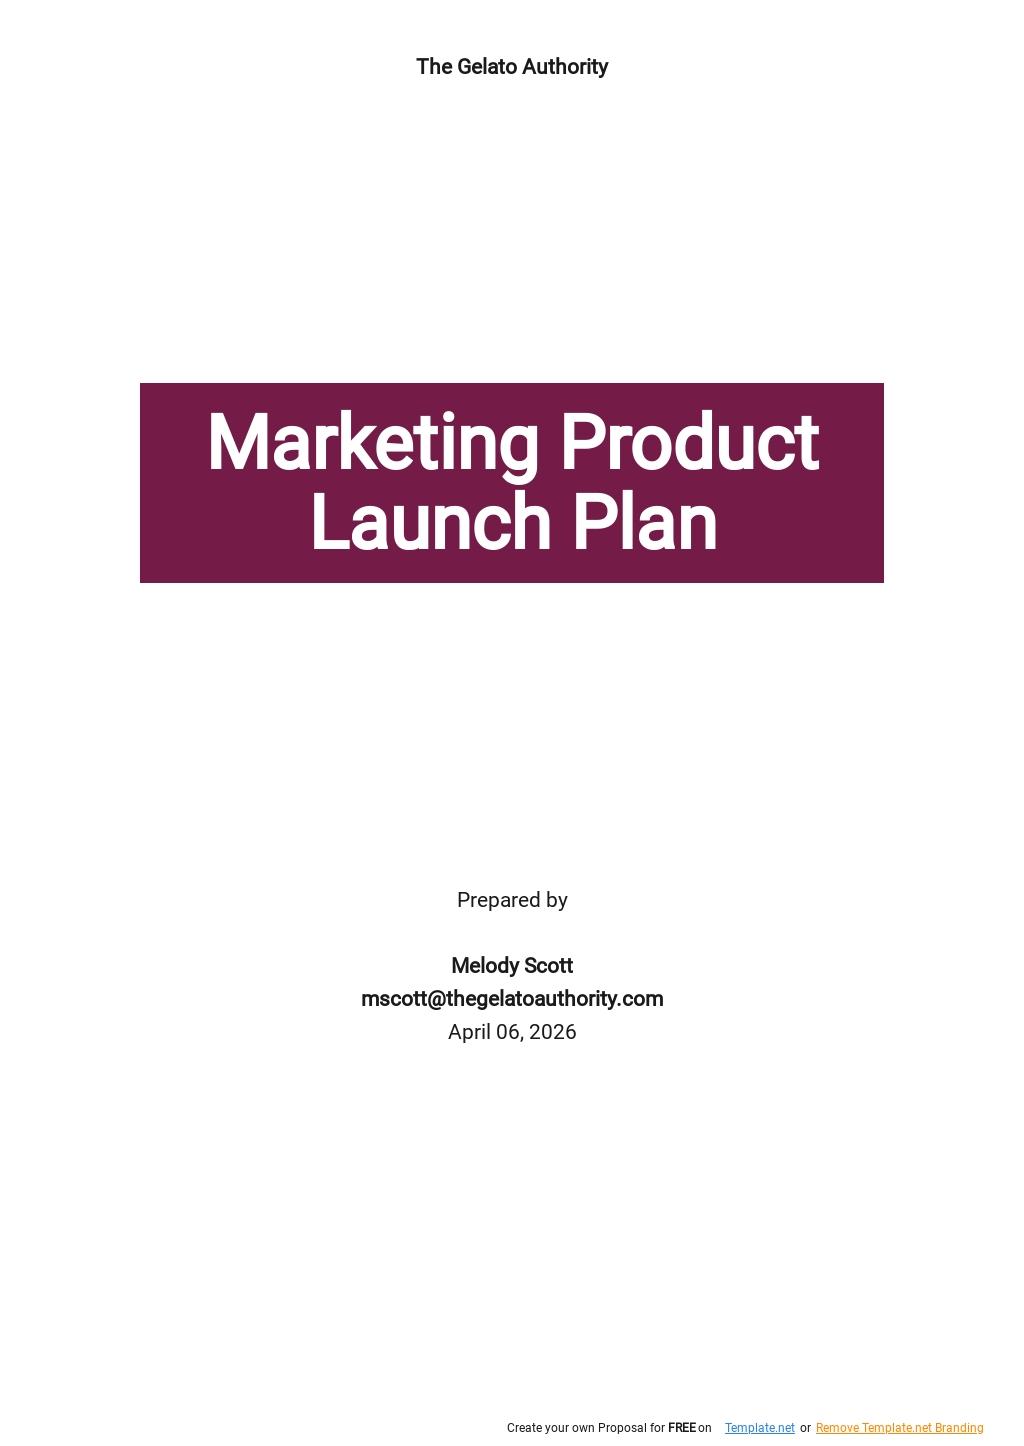 Marketing Product Launch Plan Template.jpe